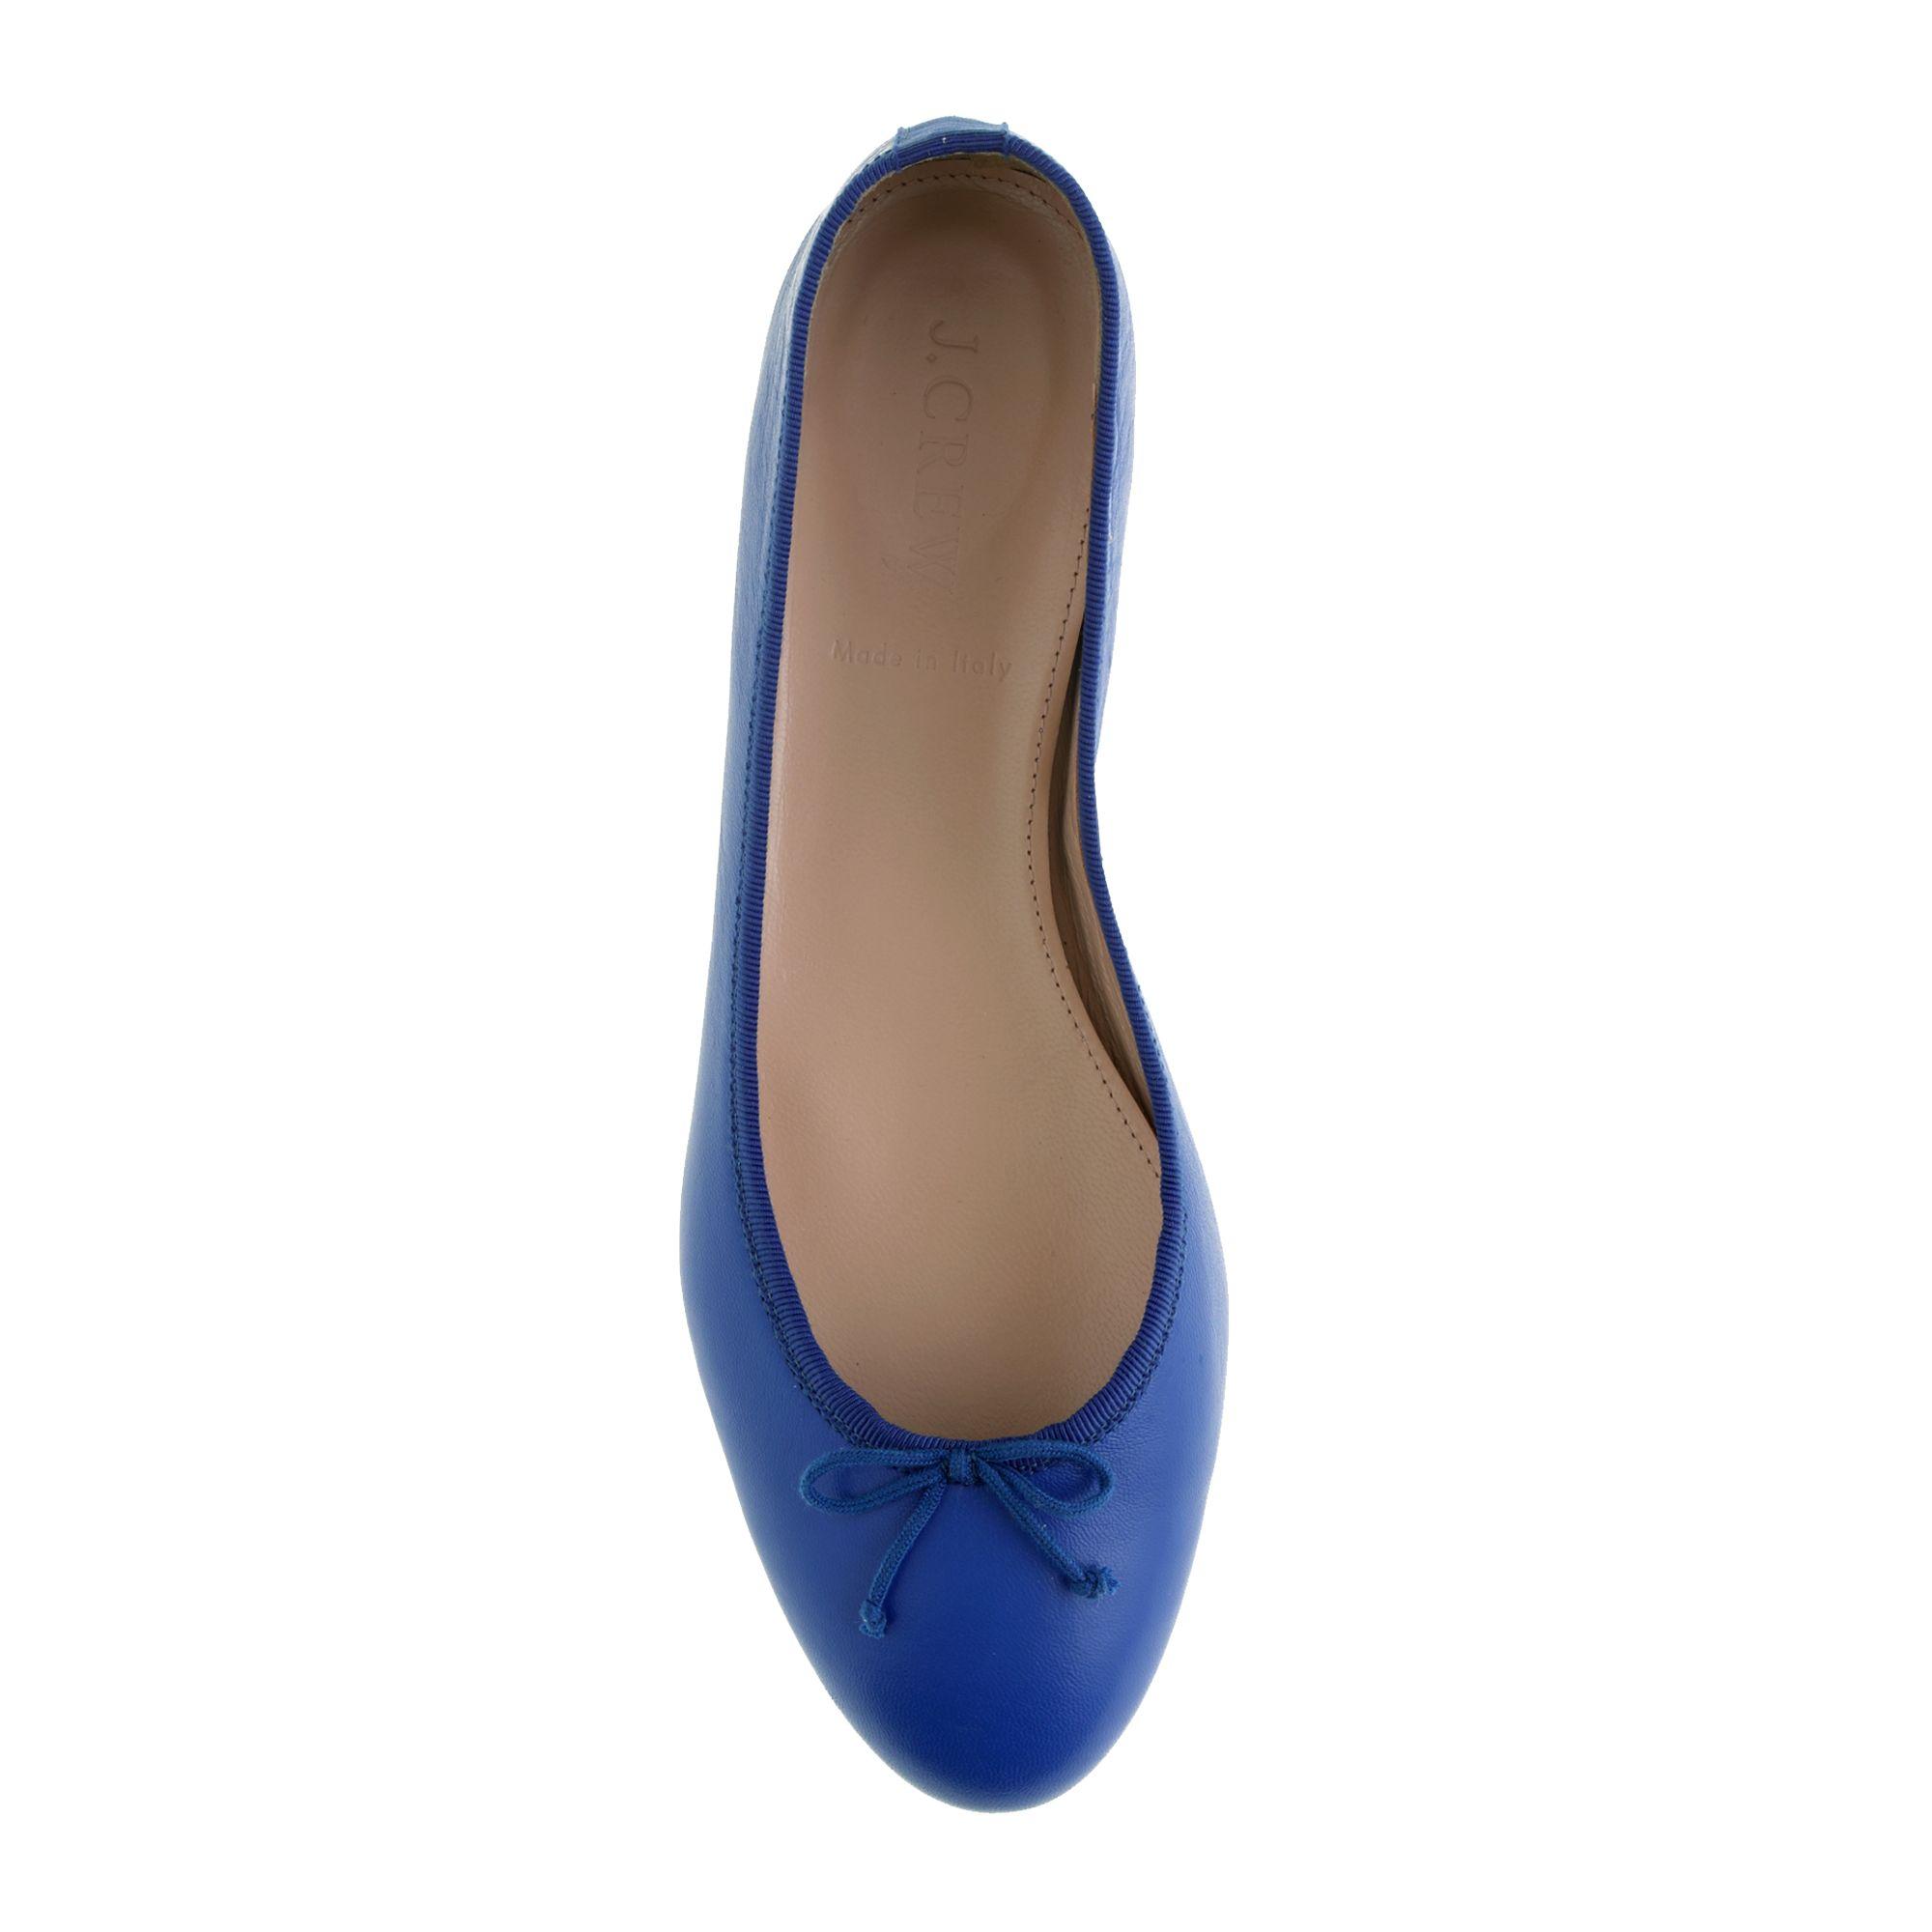 J.crew Kiki Ballet Flats in Blue